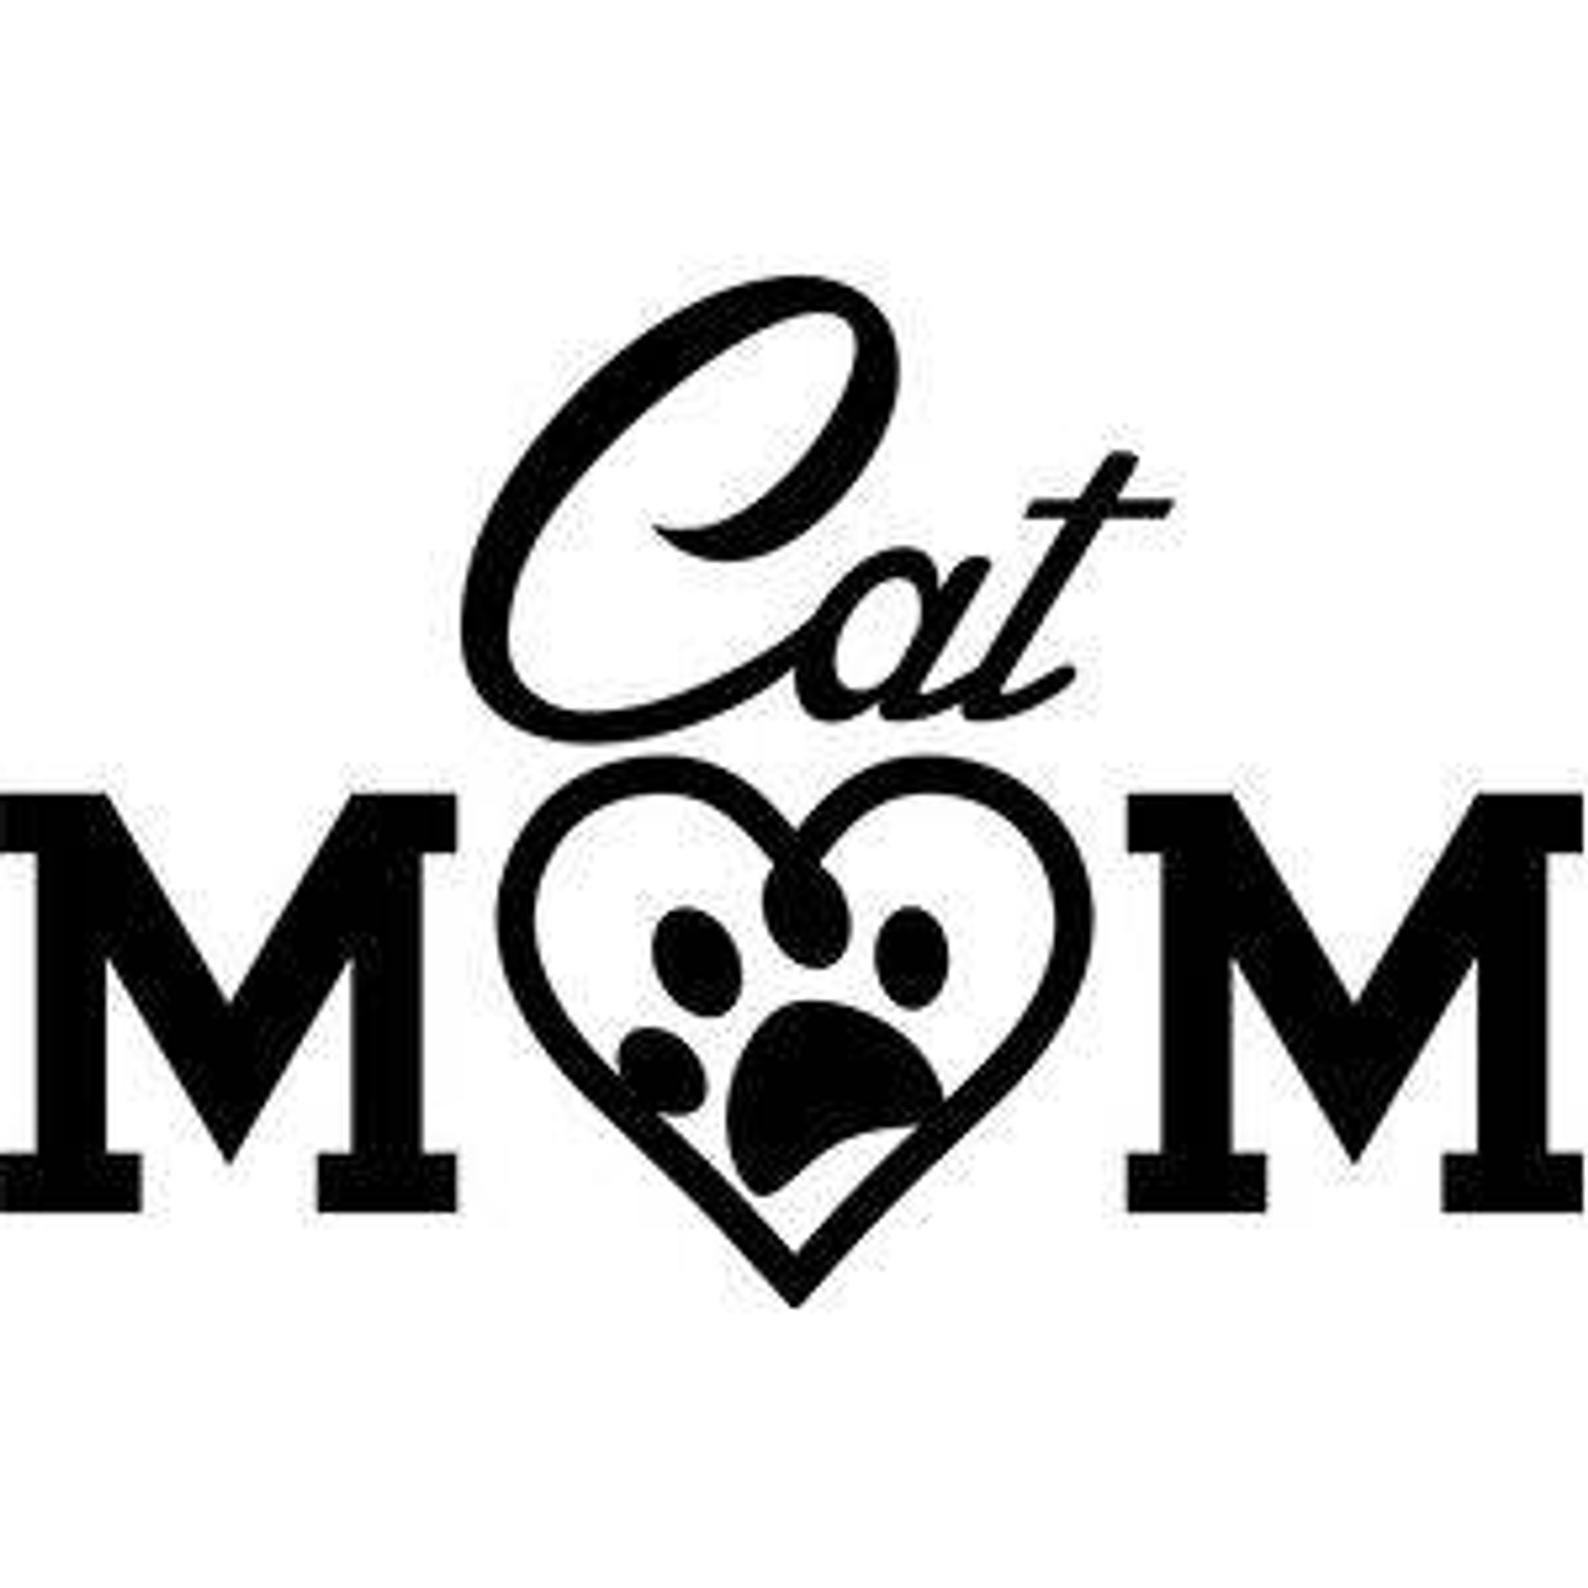 Cat mom paw print vinyl car decal bumper window sticker